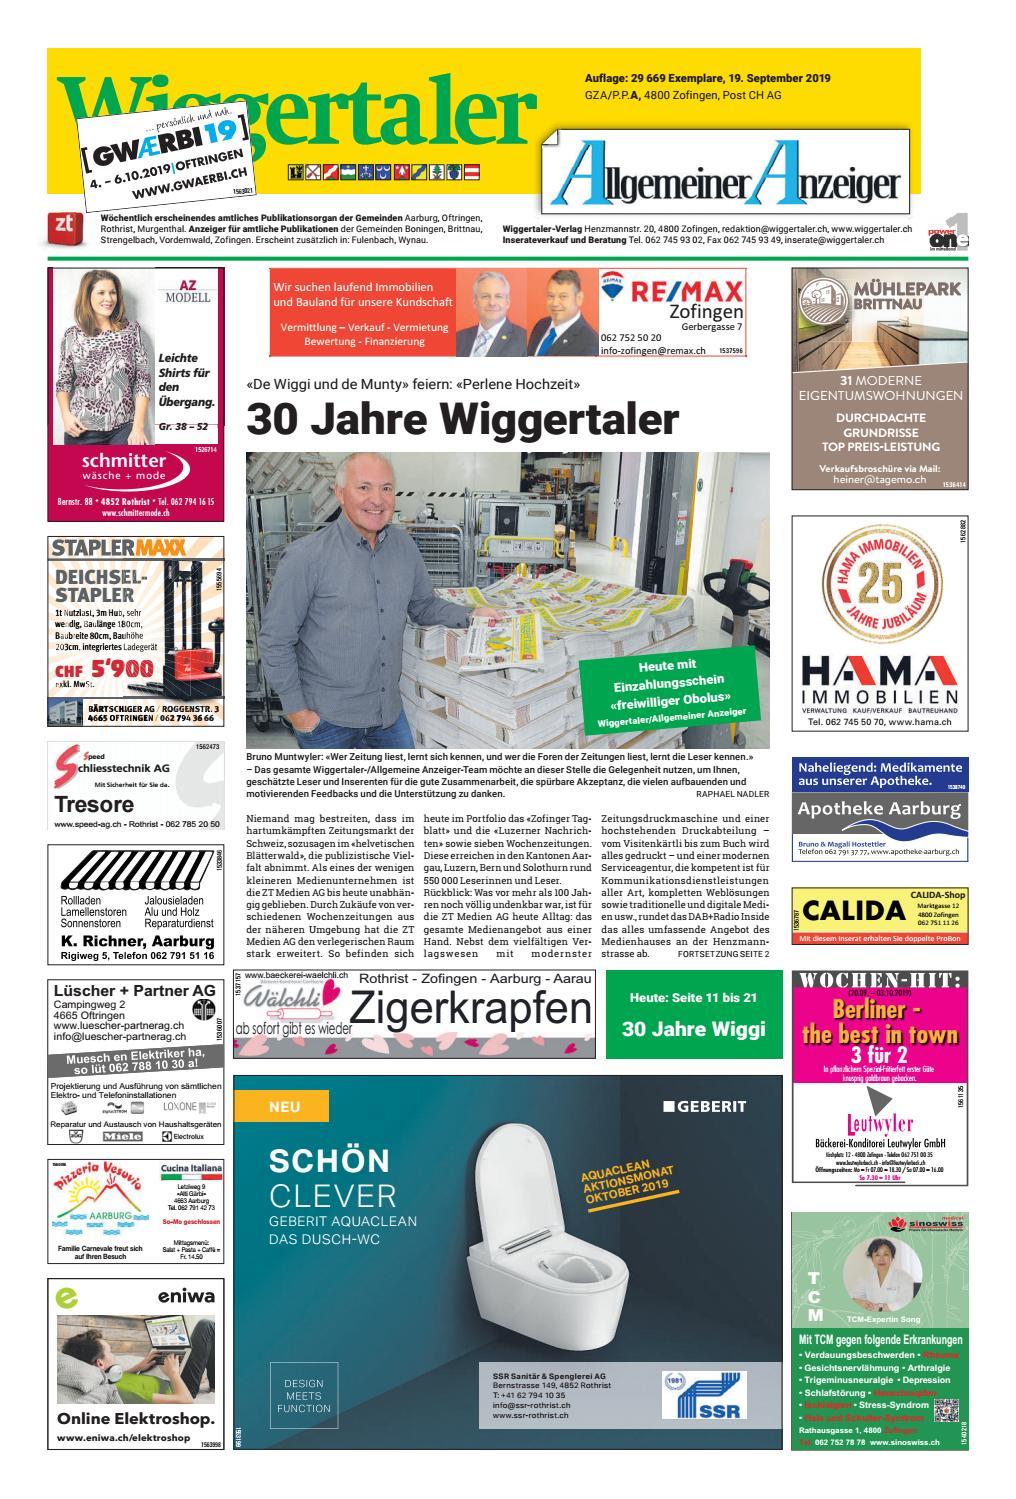 Wiggertaler 3819 by ZT Medien AG issuu